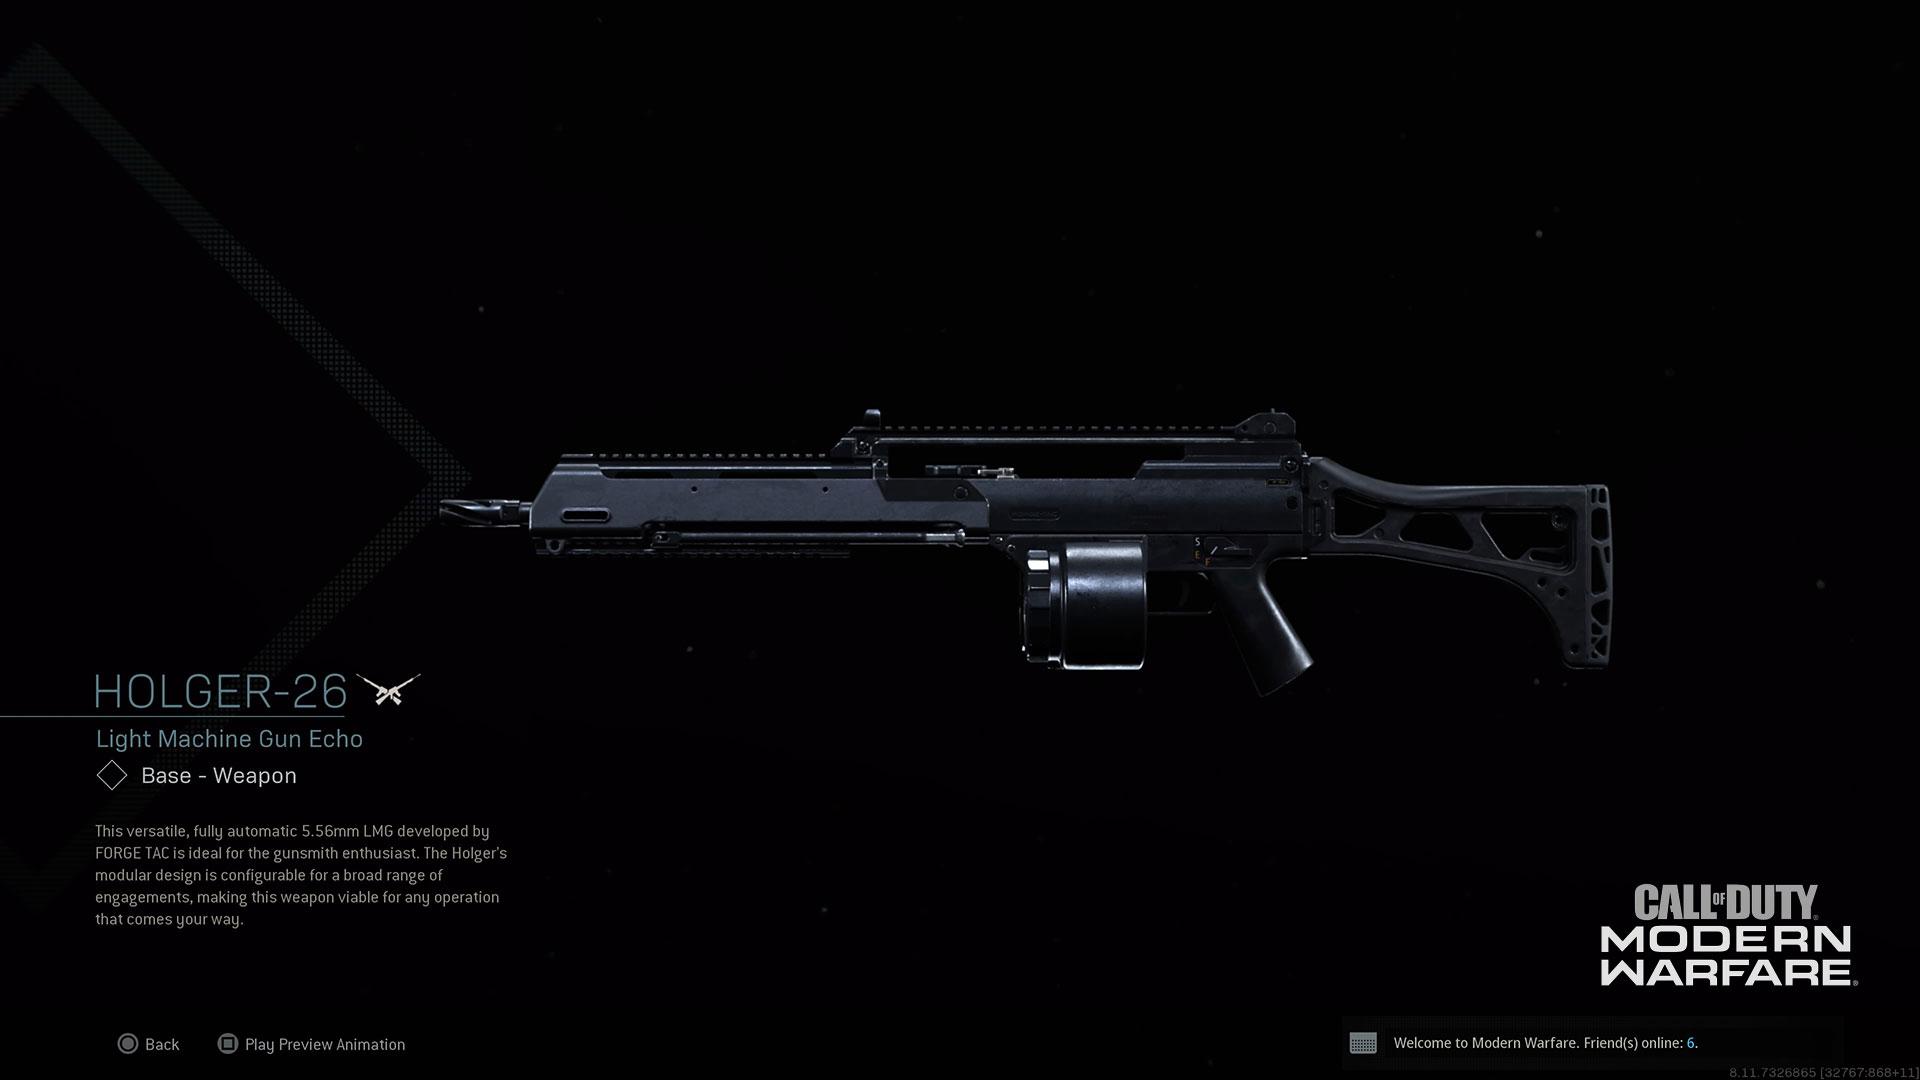 Modern Warfare Weapon Holger-26